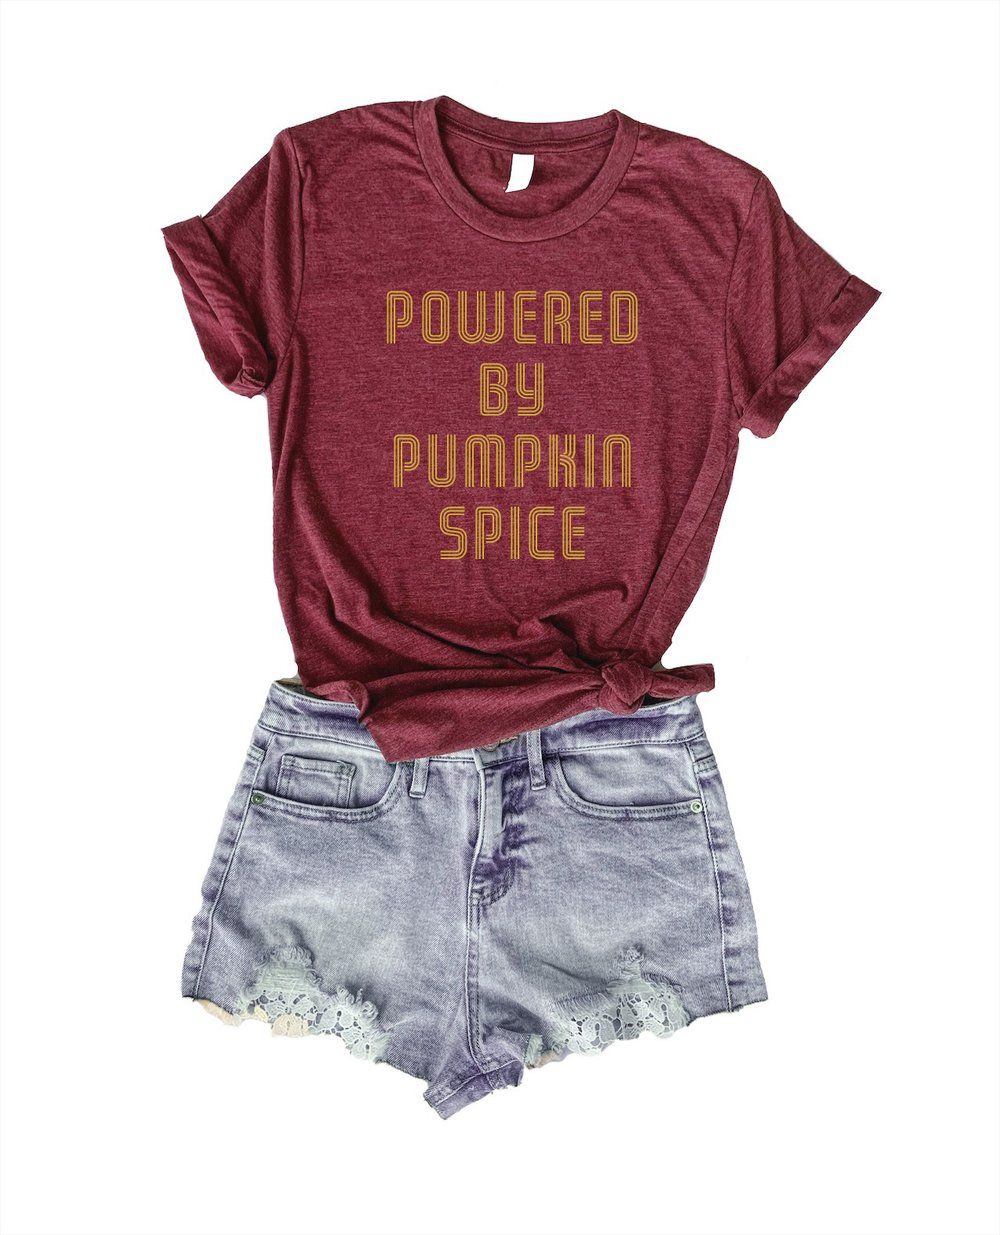 POWERED BY PUMPKIN SPICE. Do you love pumpkin spice as